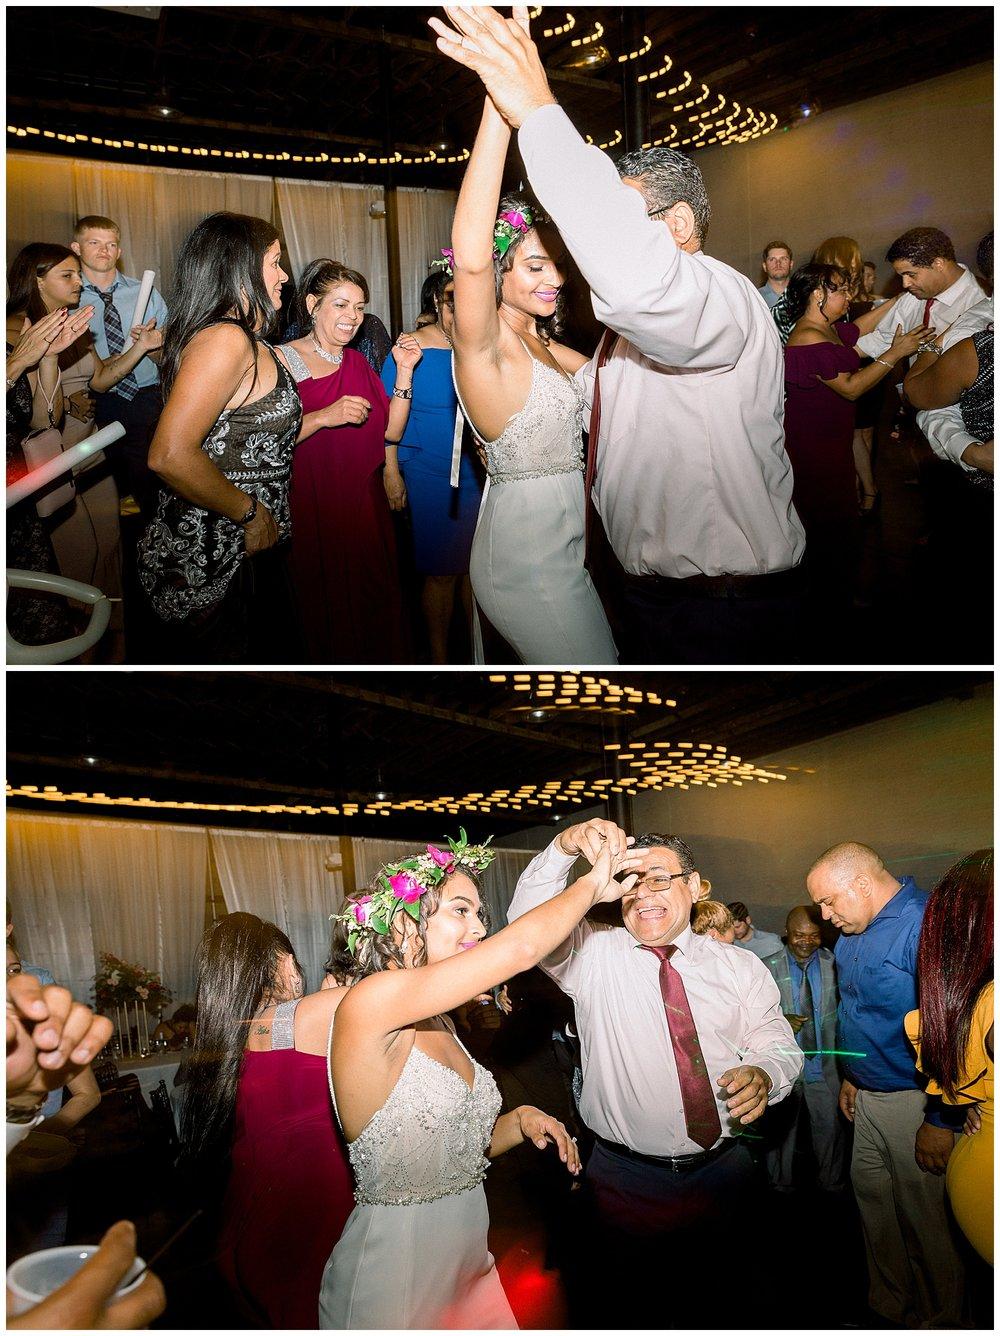 jessicafredericks_lakeland_tampa_wedding_purple_crazy hour_0104.jpg